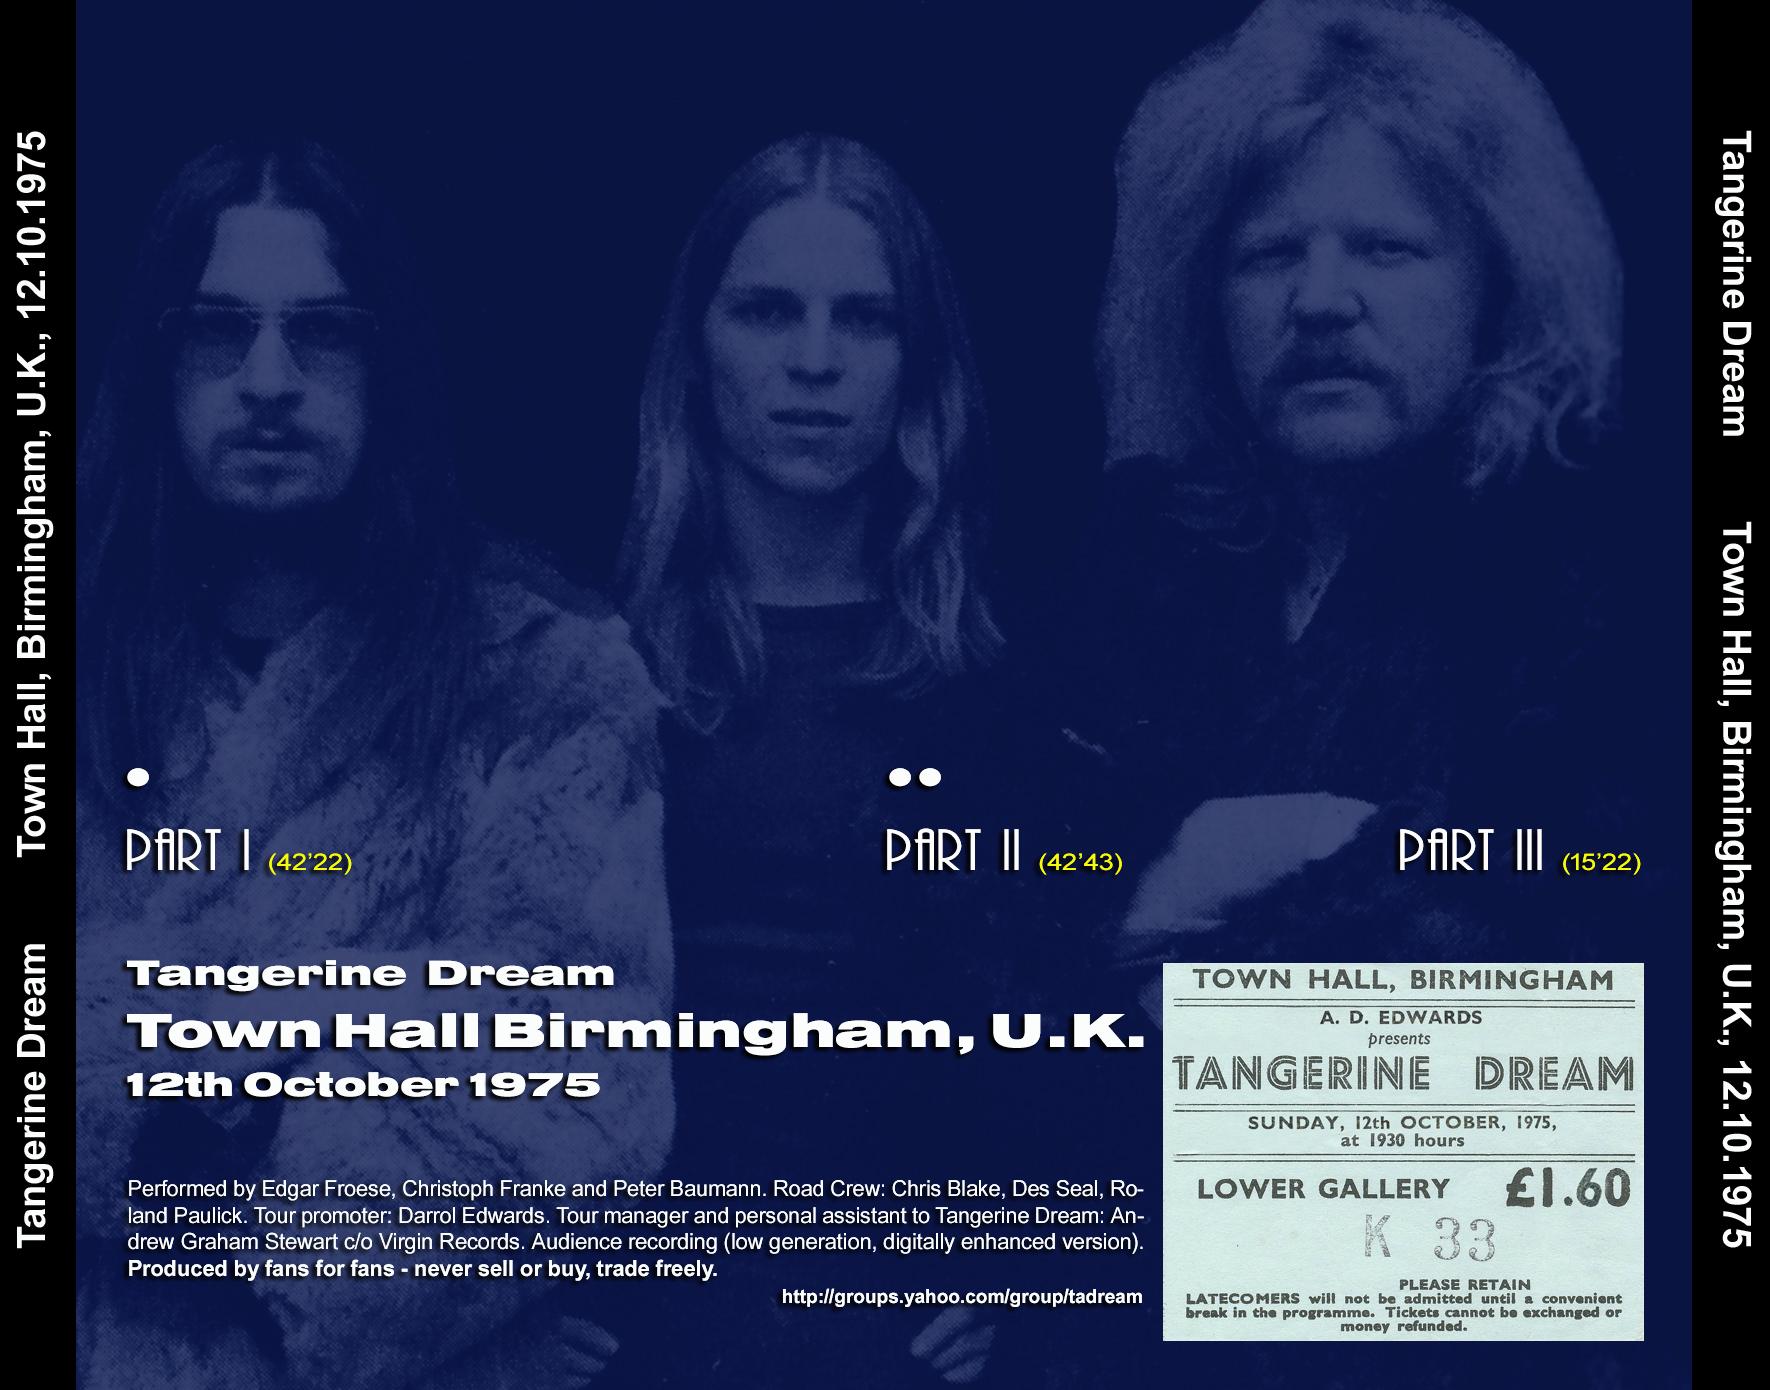 TangerineDream1975-10-12TownHallBirminghamUK1.jpg